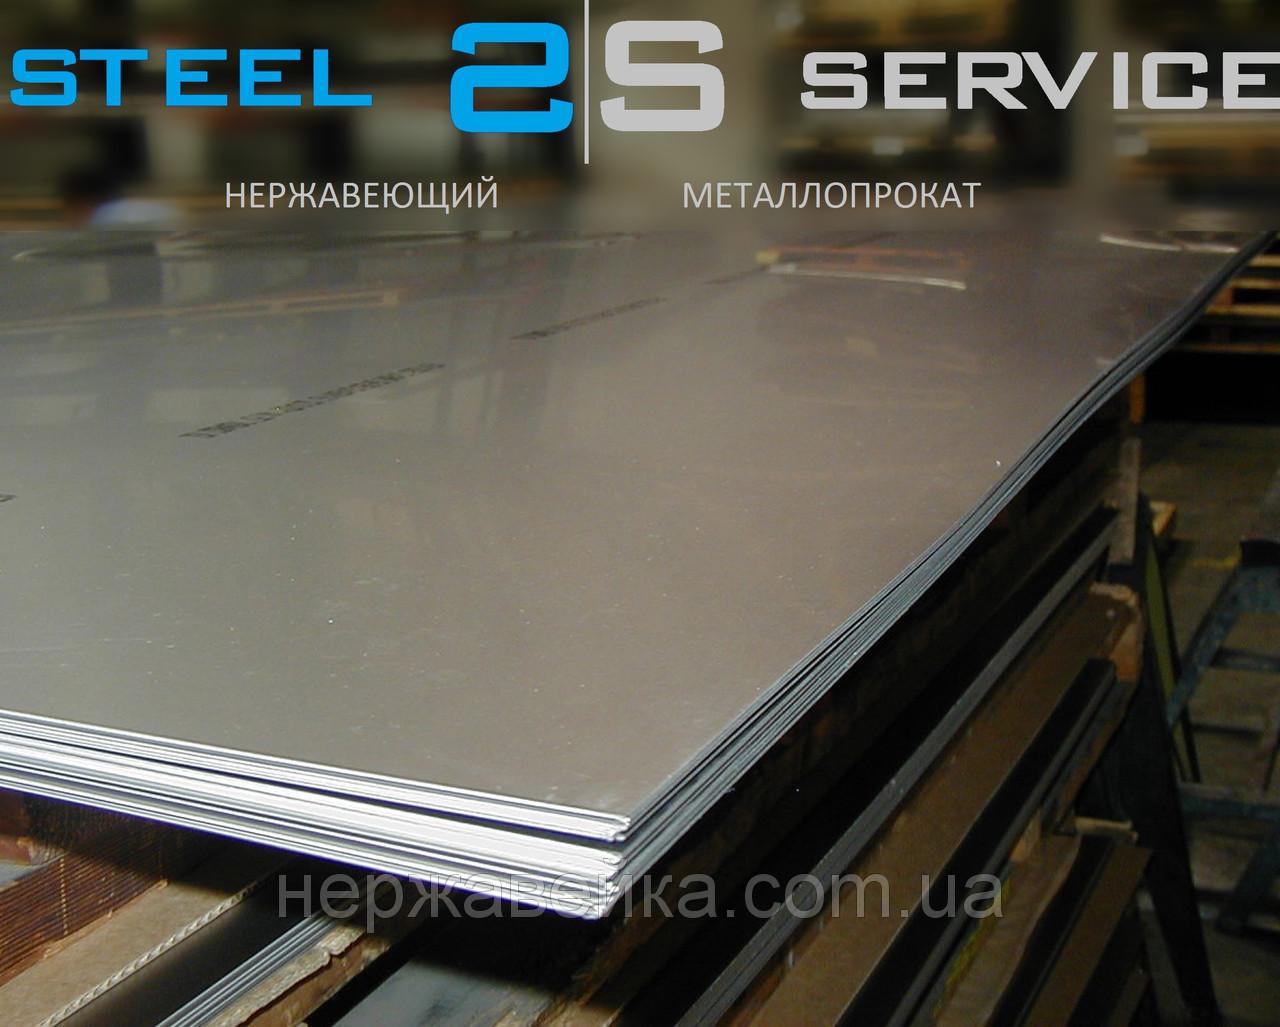 Нержавеющий лист 4х1000х2000мм  AISI  316Ti(10Х17Н13М2Т) 2B - матовый,  кислотостойкий